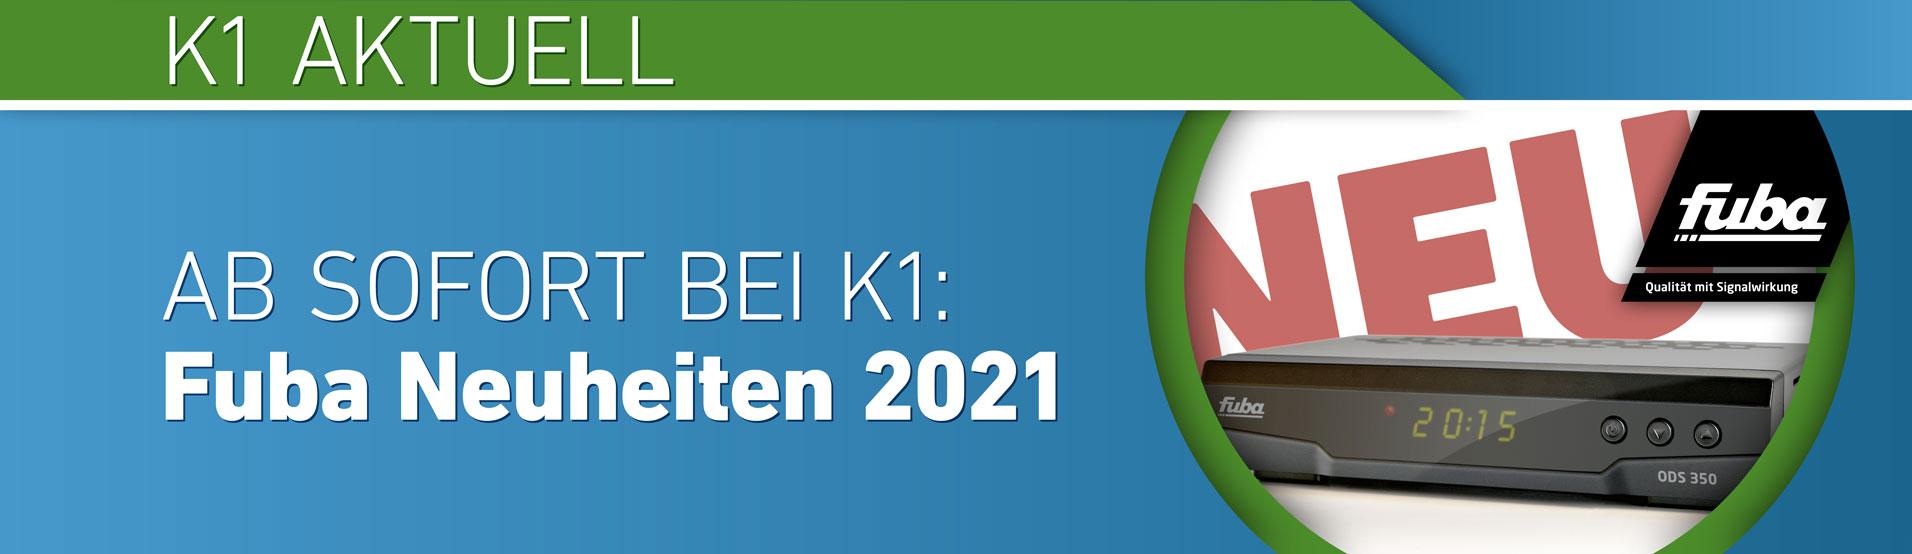 K1 Electronic K1 Aktuell – Fuba Neuheiten 2021